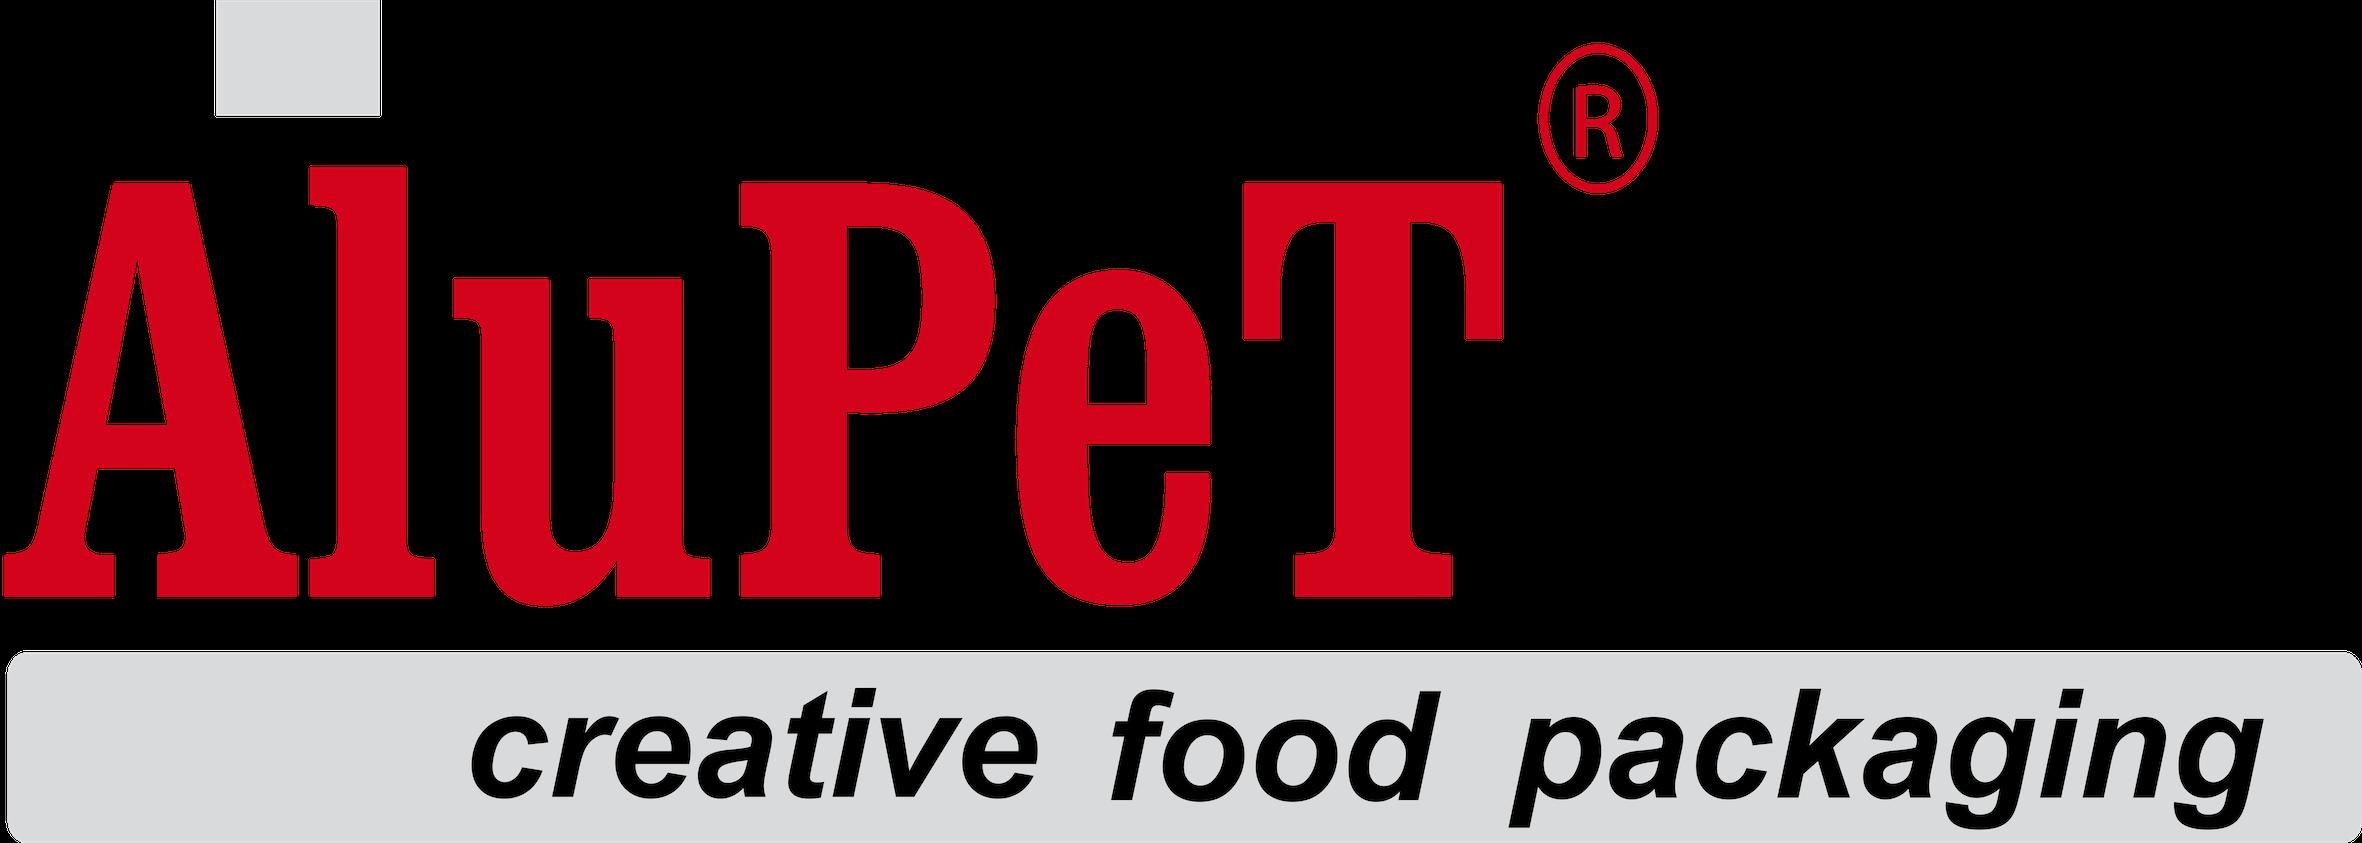 Logo Alupet HR klein.png